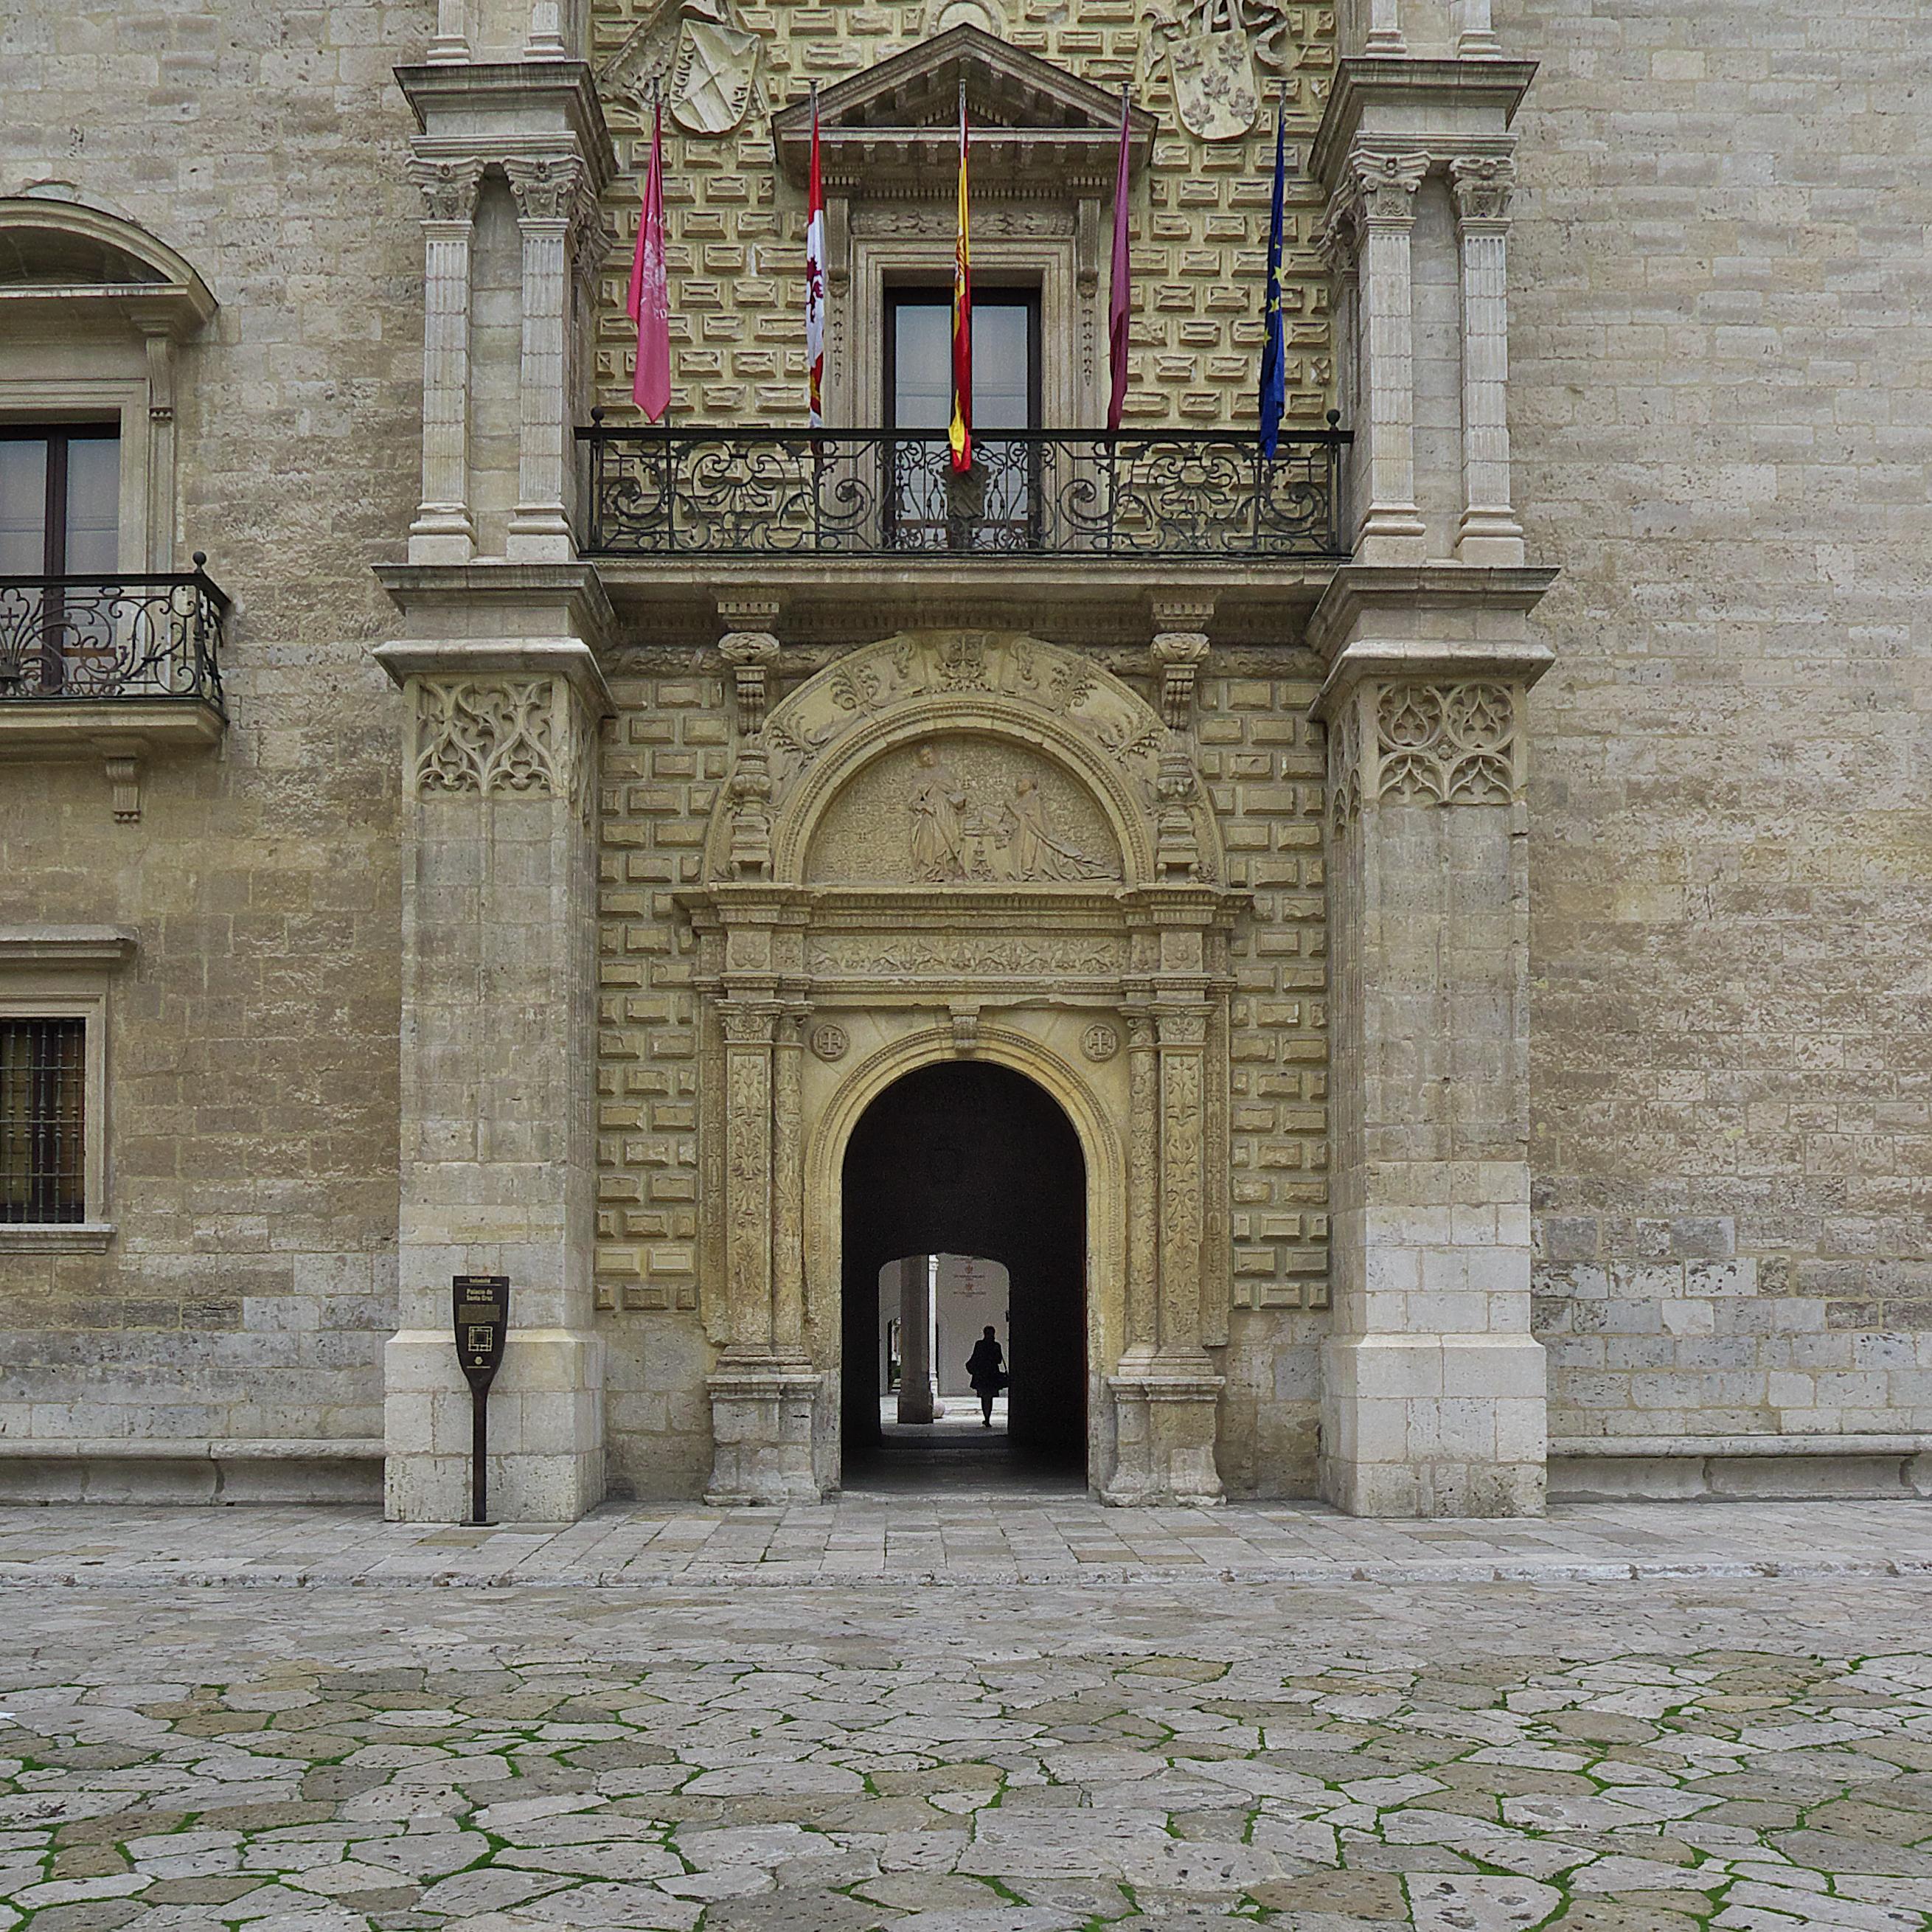 File:Palacio de Santa Cruz (Valladolid). Portada.jpg - Wikimedia Commons